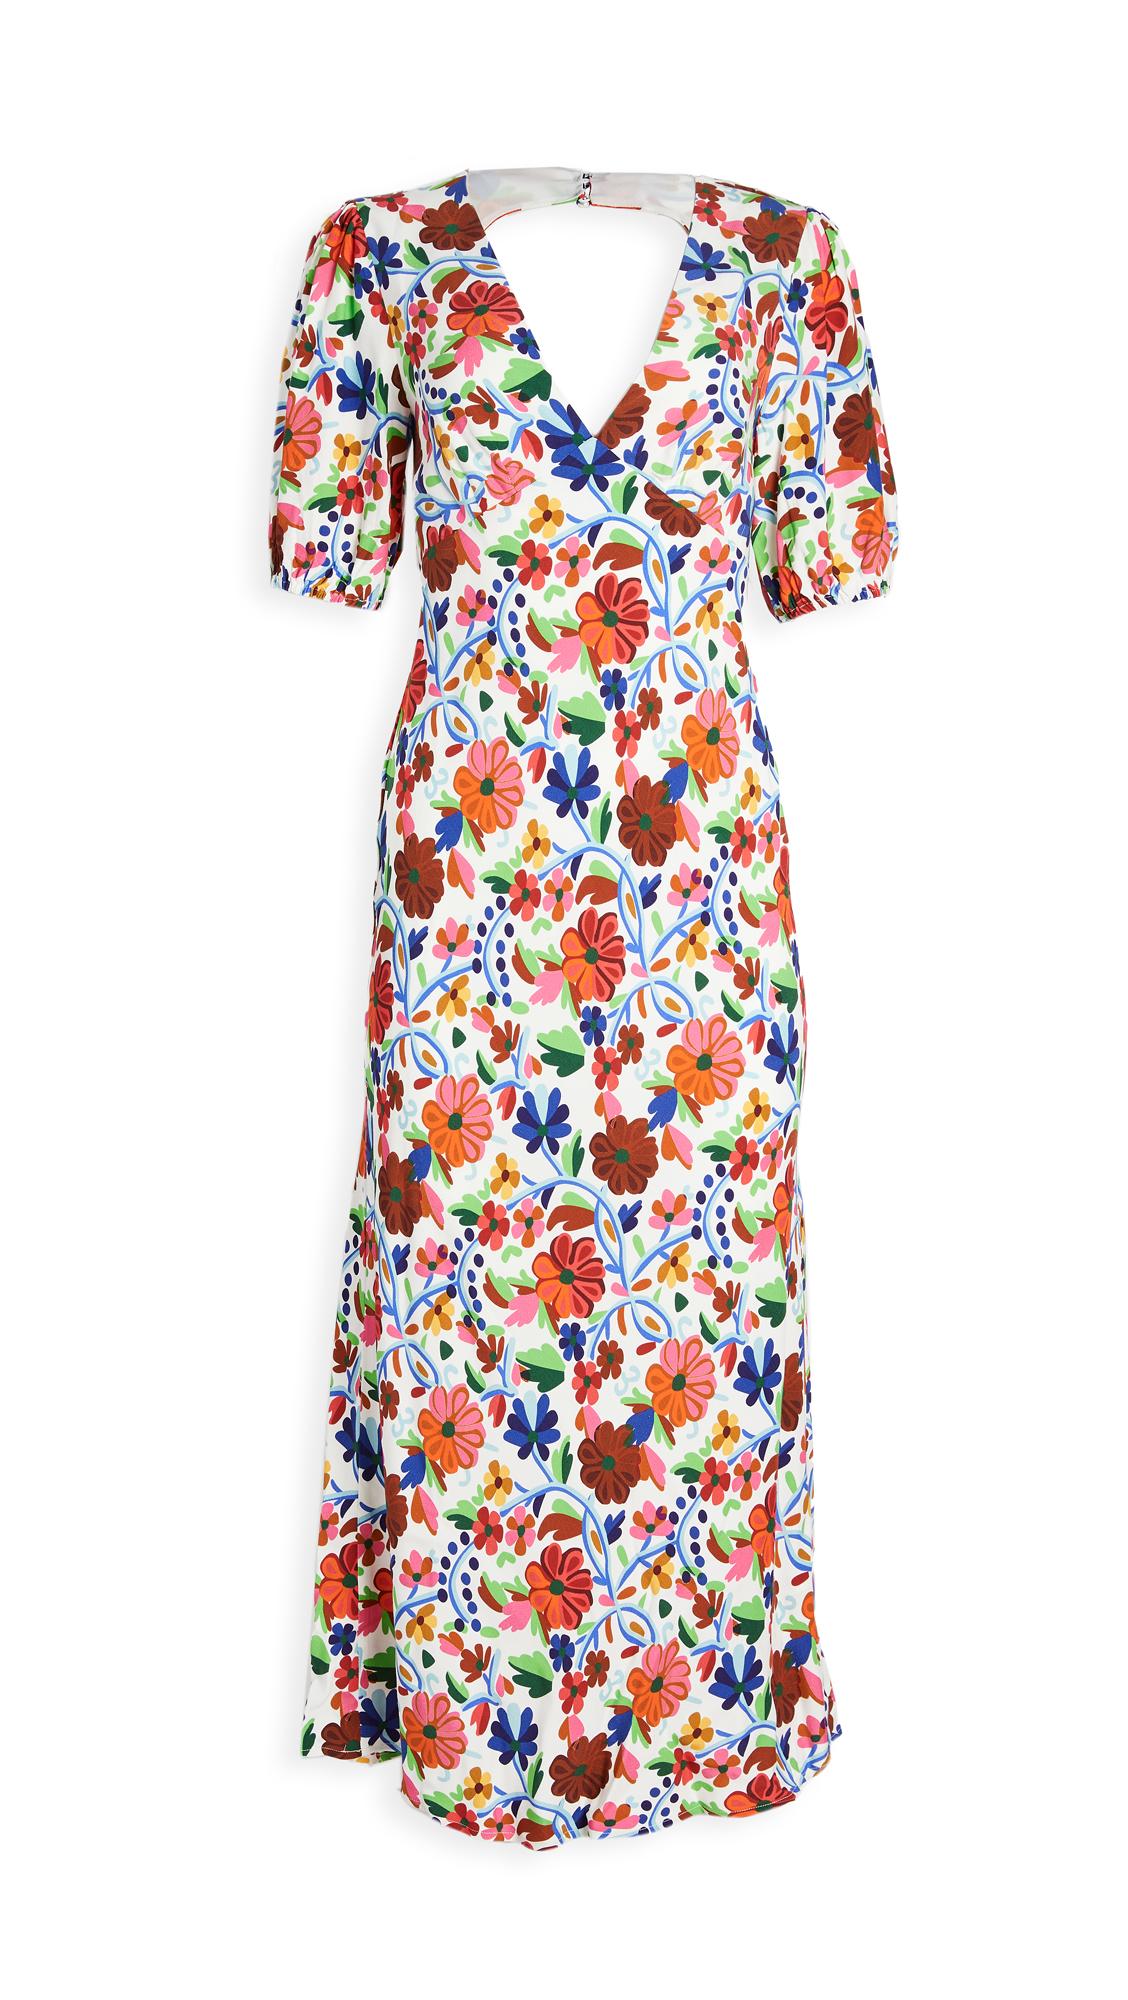 RIXO Steph Dress - 30% Off Sale